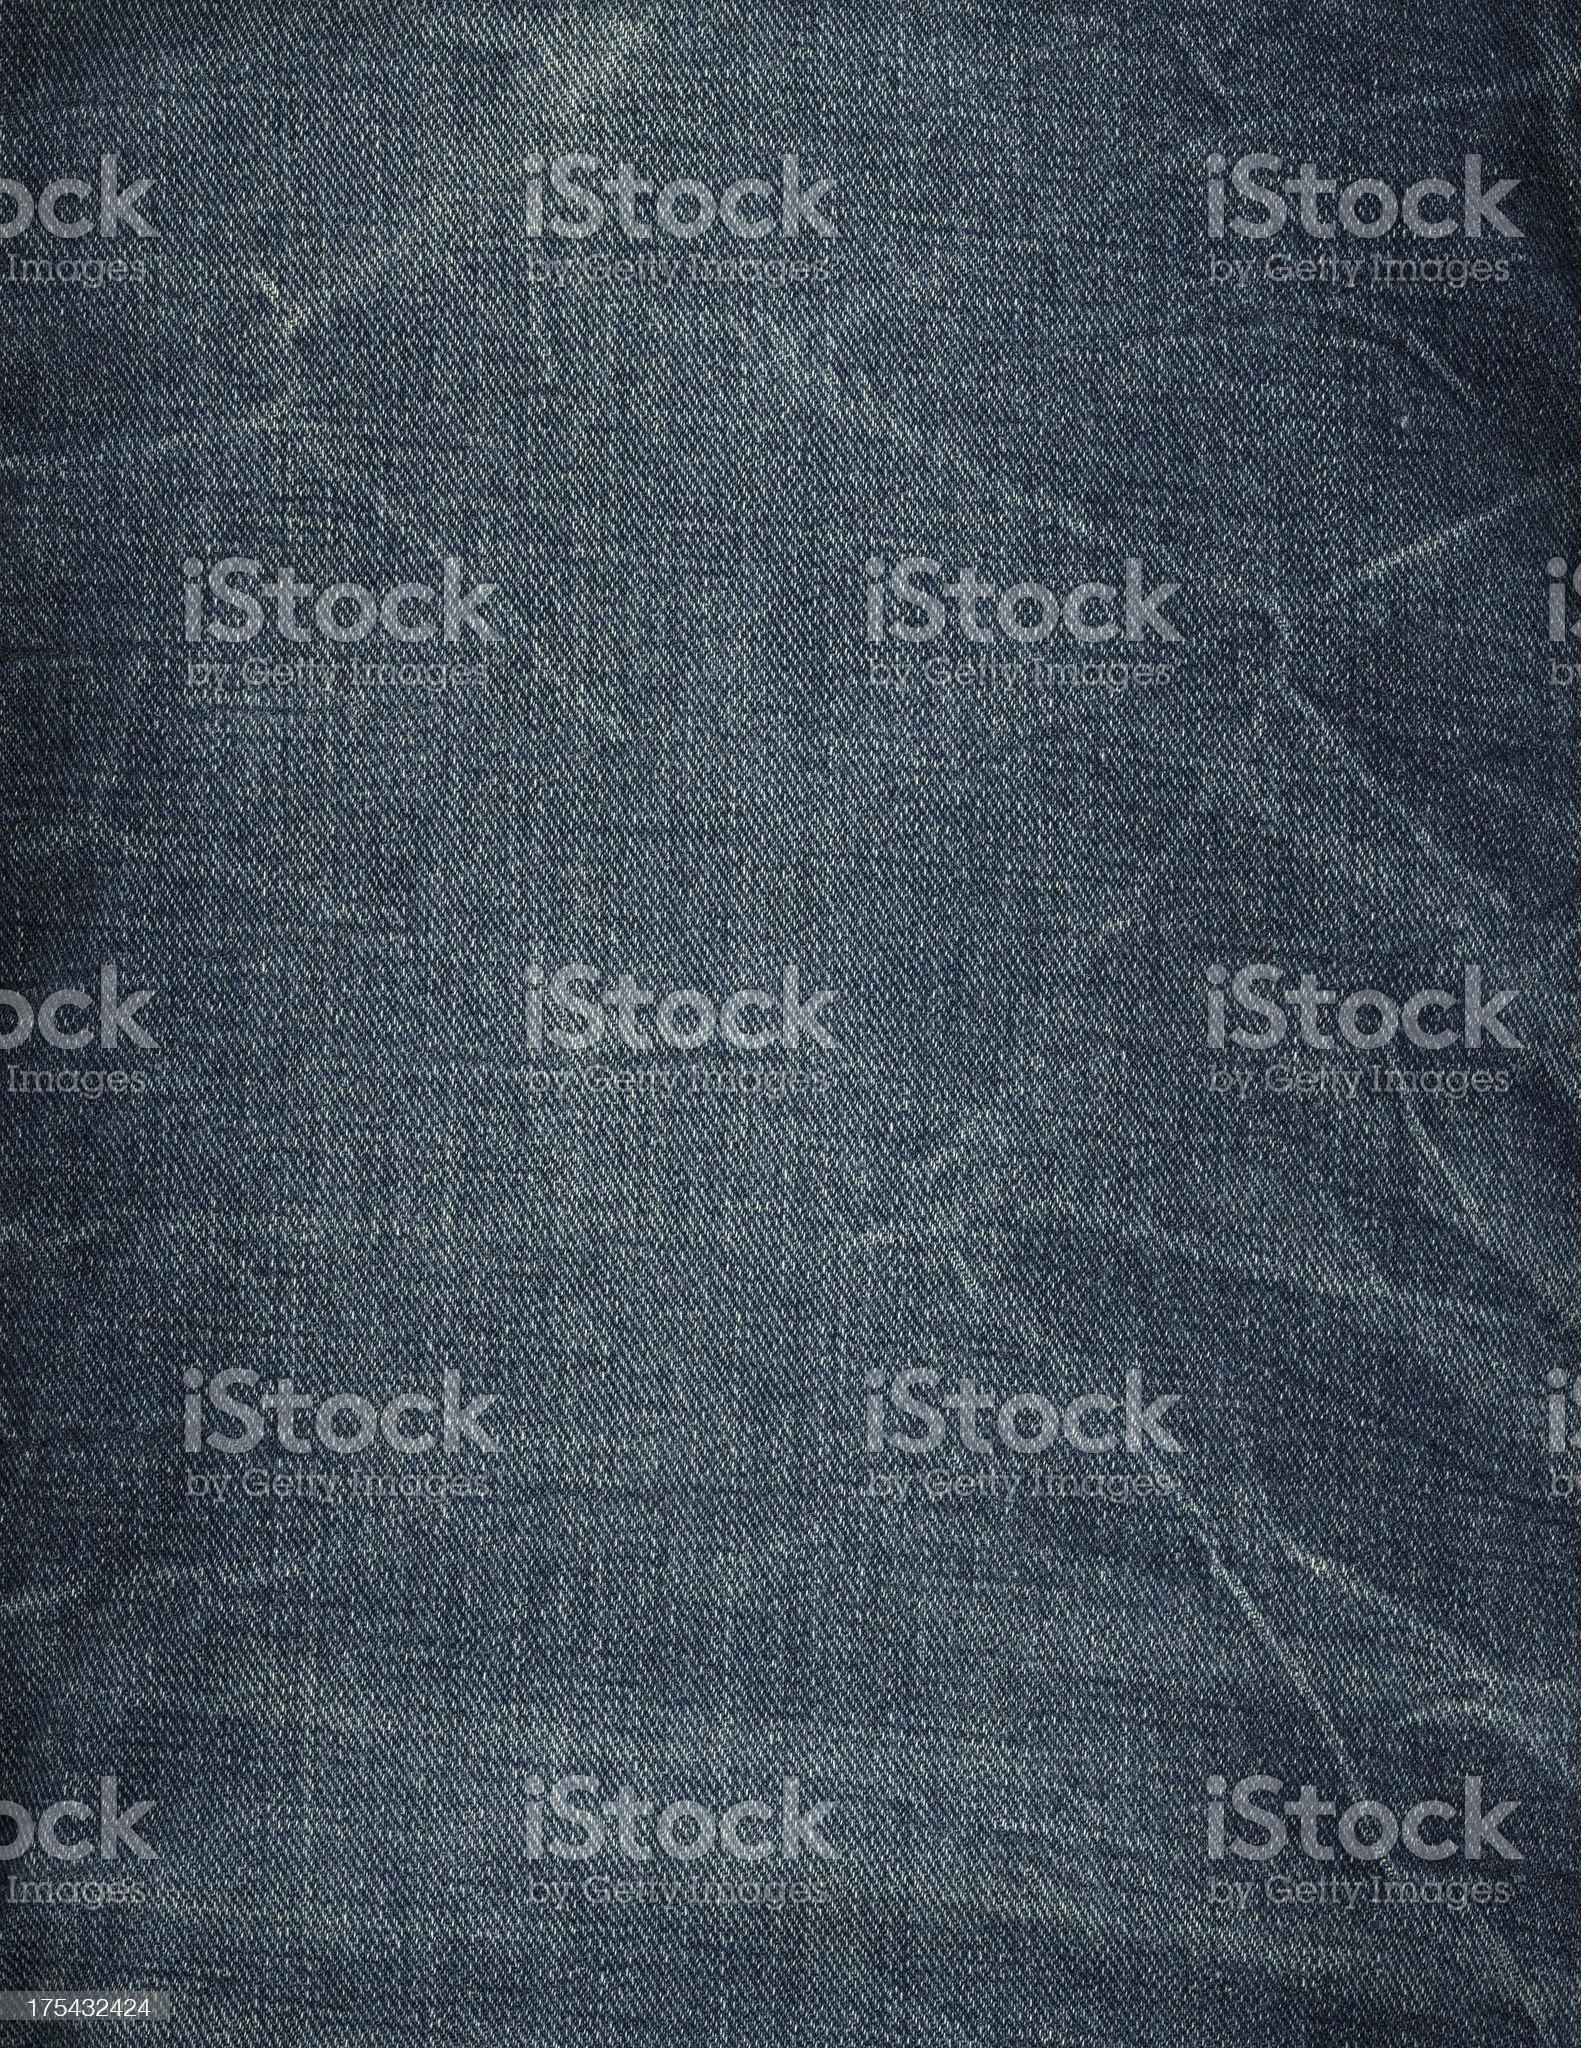 denim background royalty-free stock photo